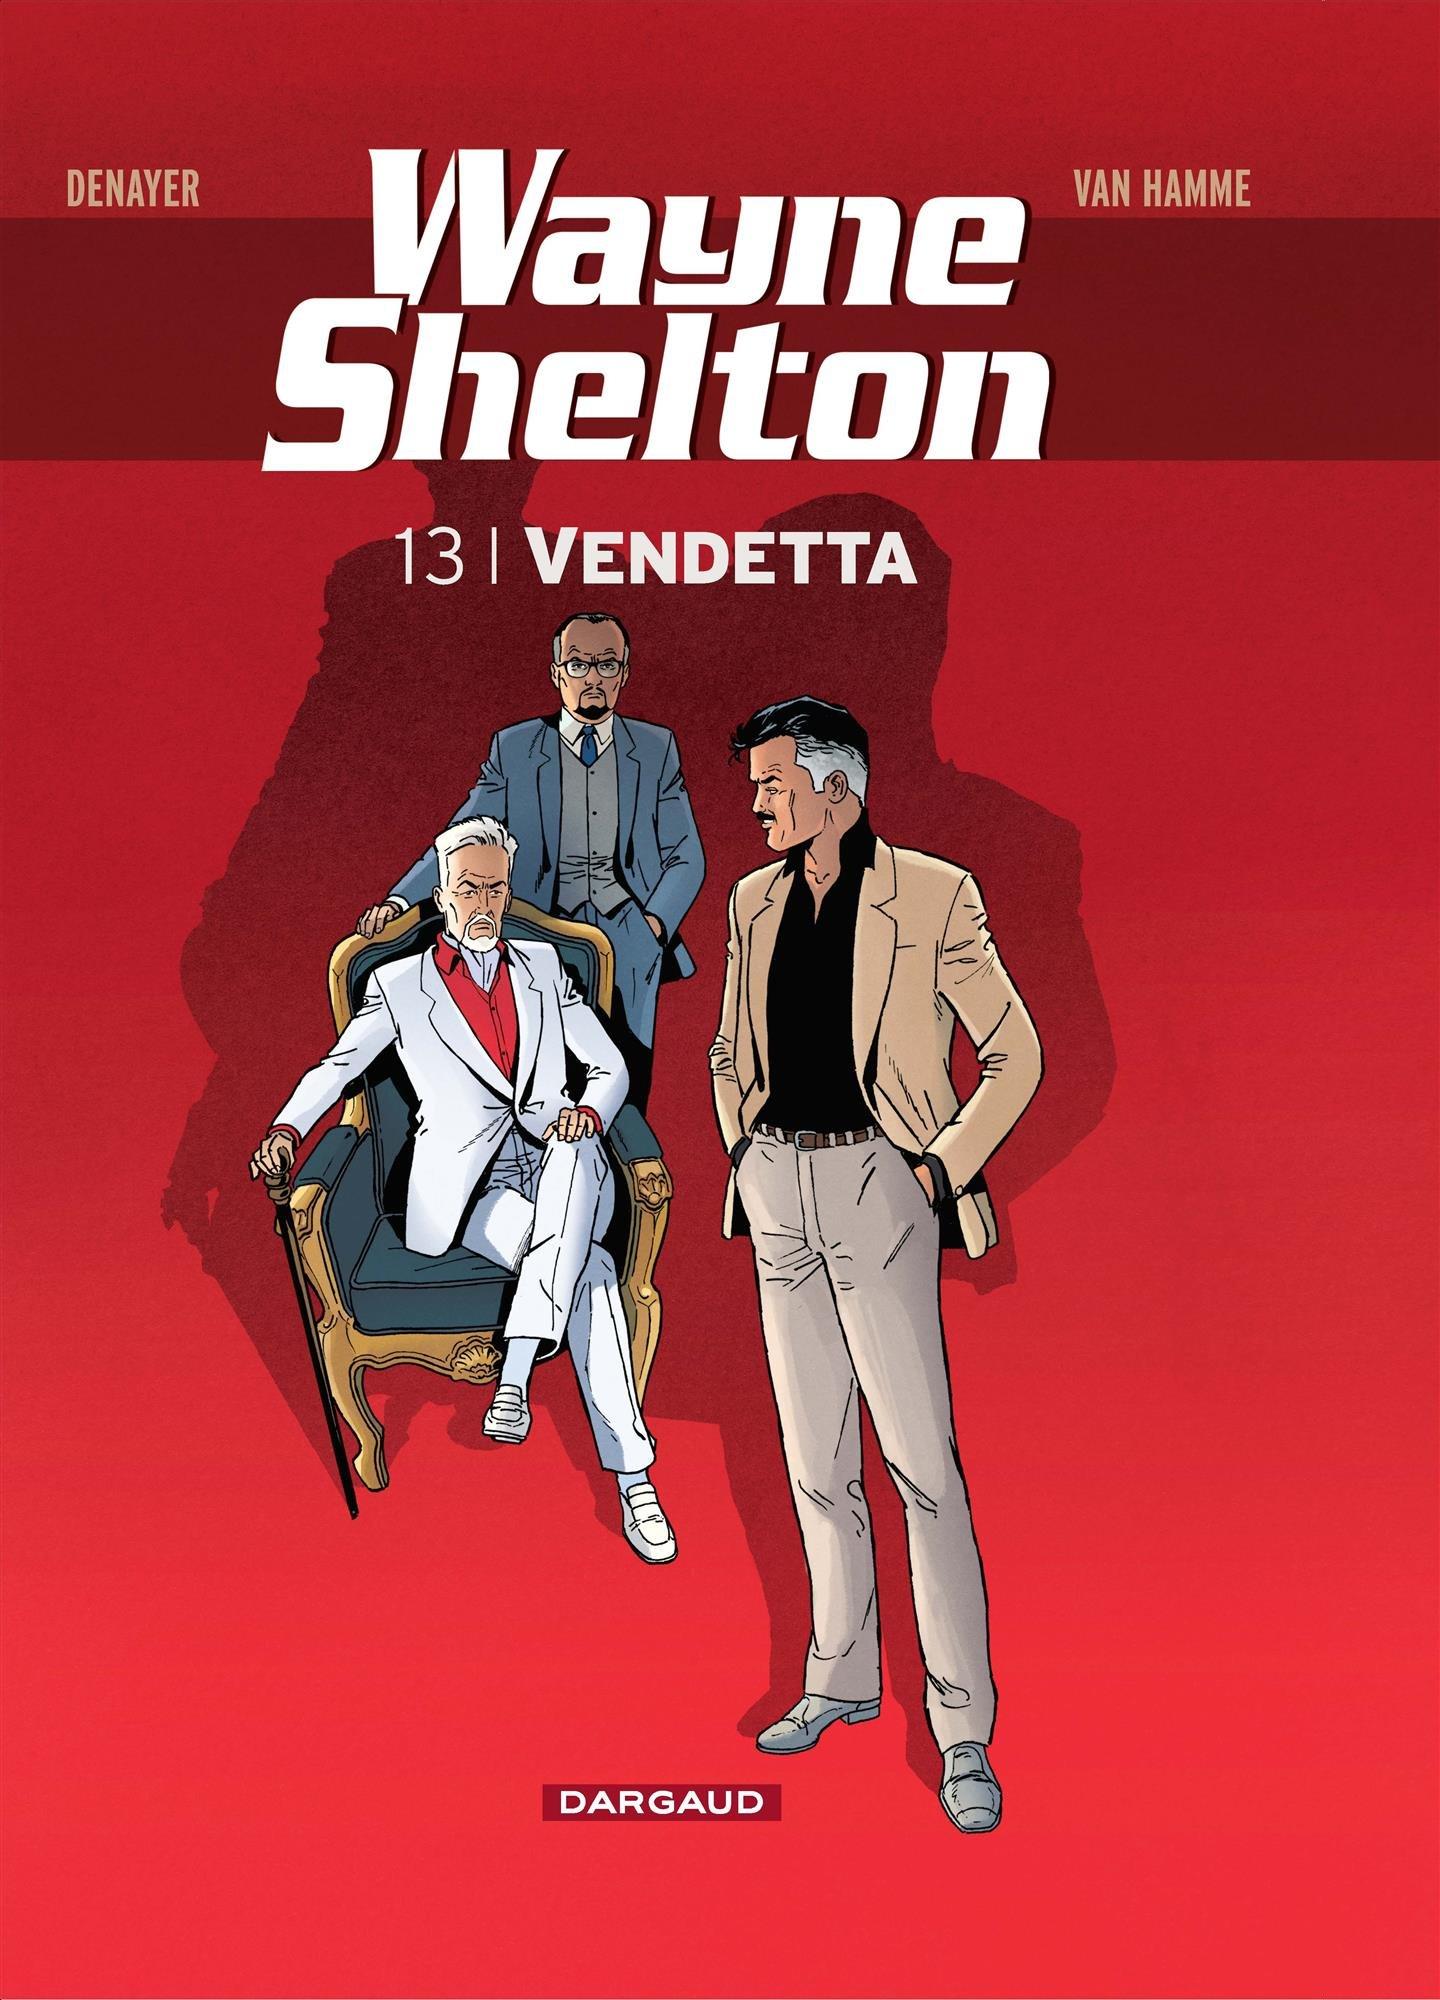 Wayne Shelton - tome 13 - Vendetta Album – 25 août 2017 Van Hamme Jean Denayer Christian Dargaud 2505064830